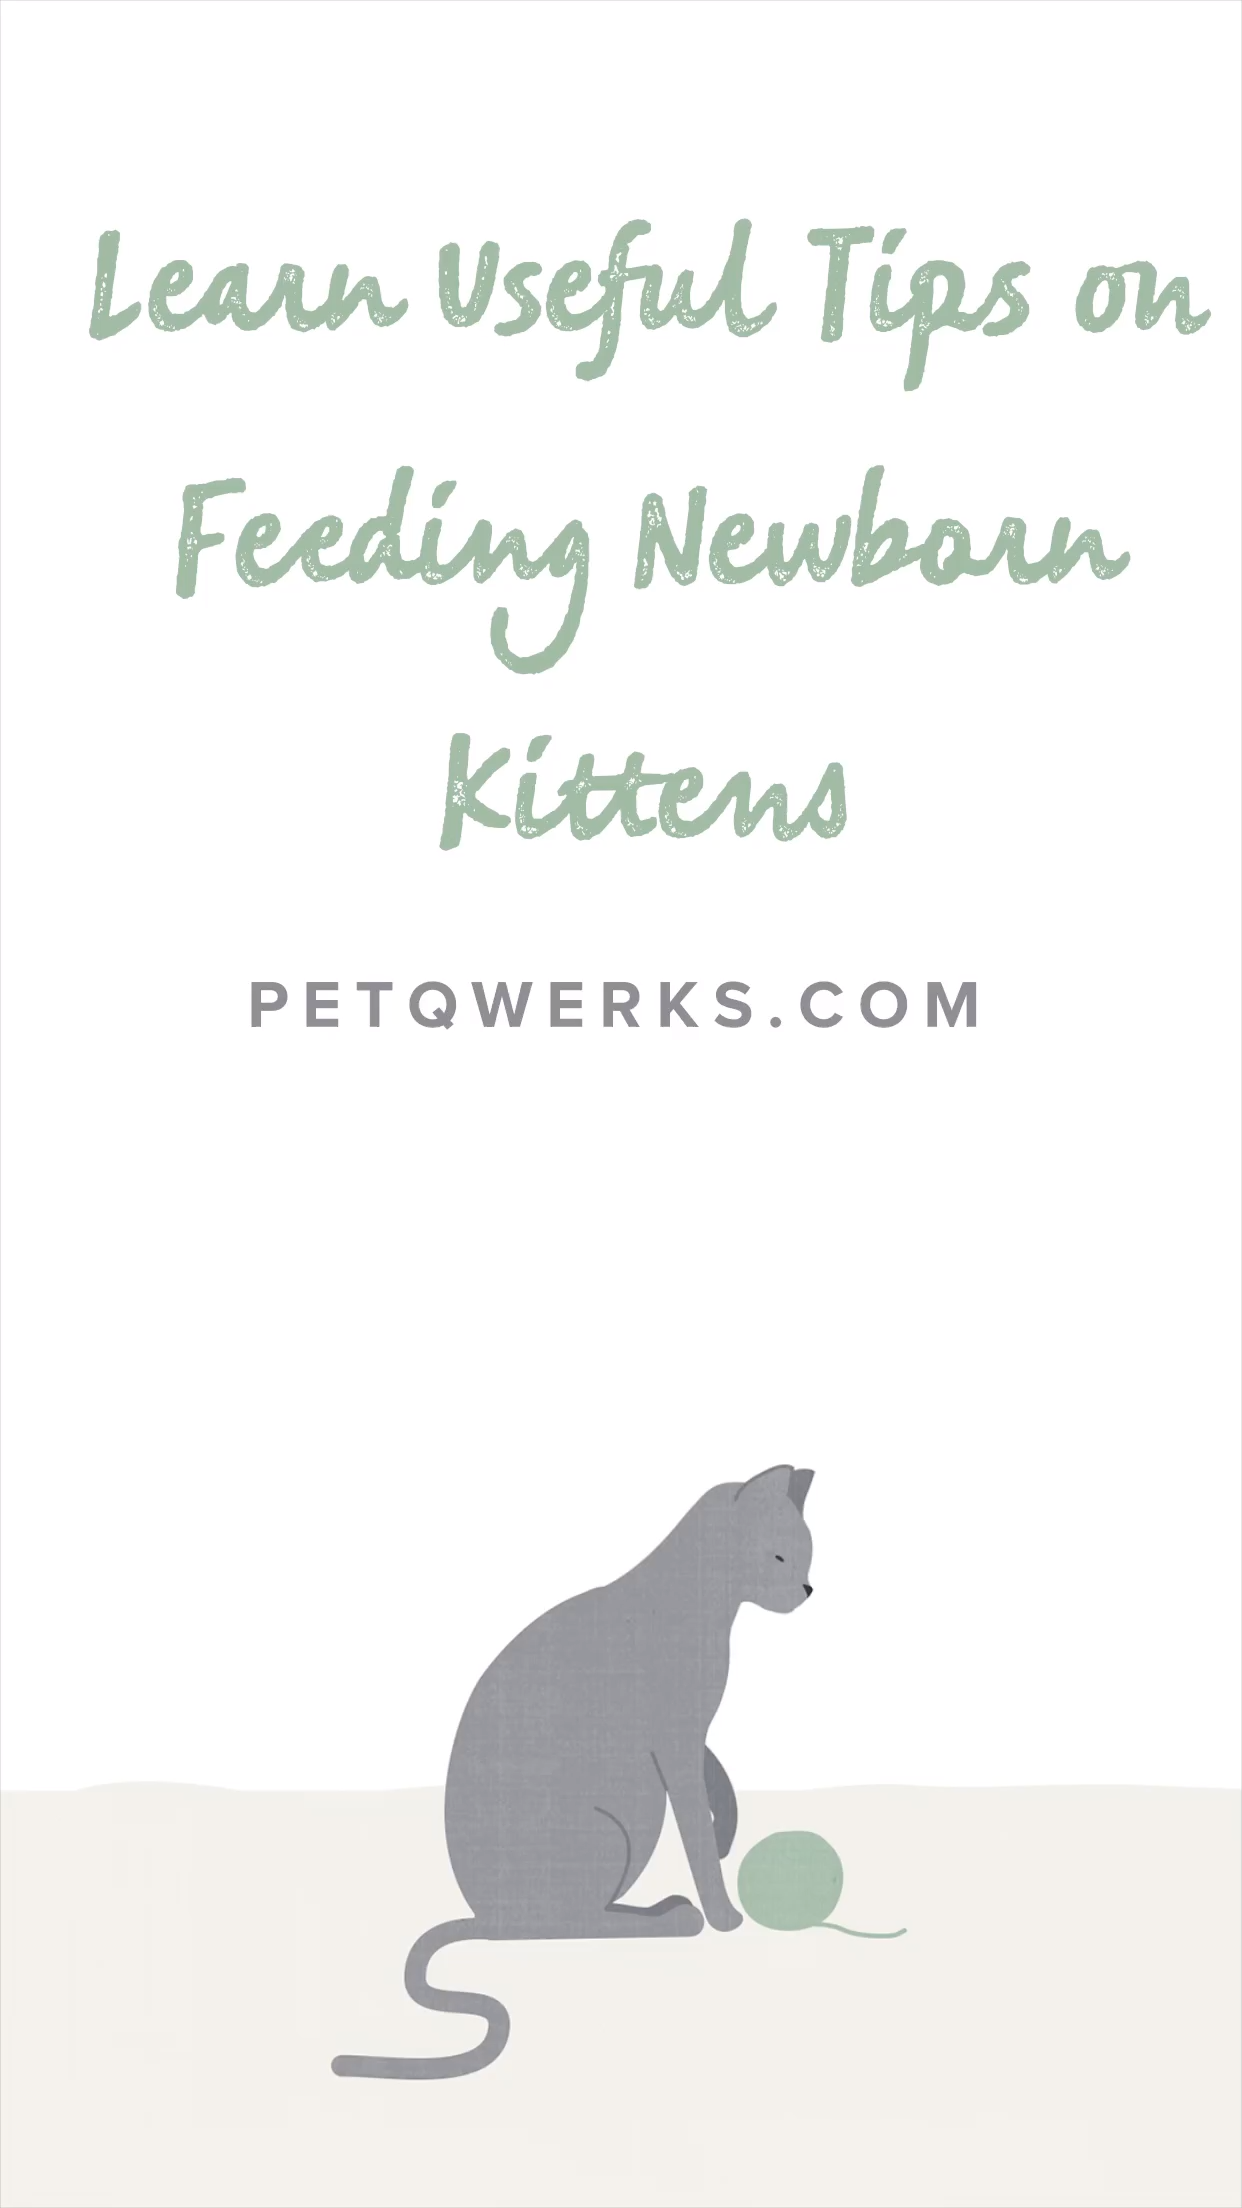 Learn Useful Tips on Feeding Newborn Kittens Pet Qwerks